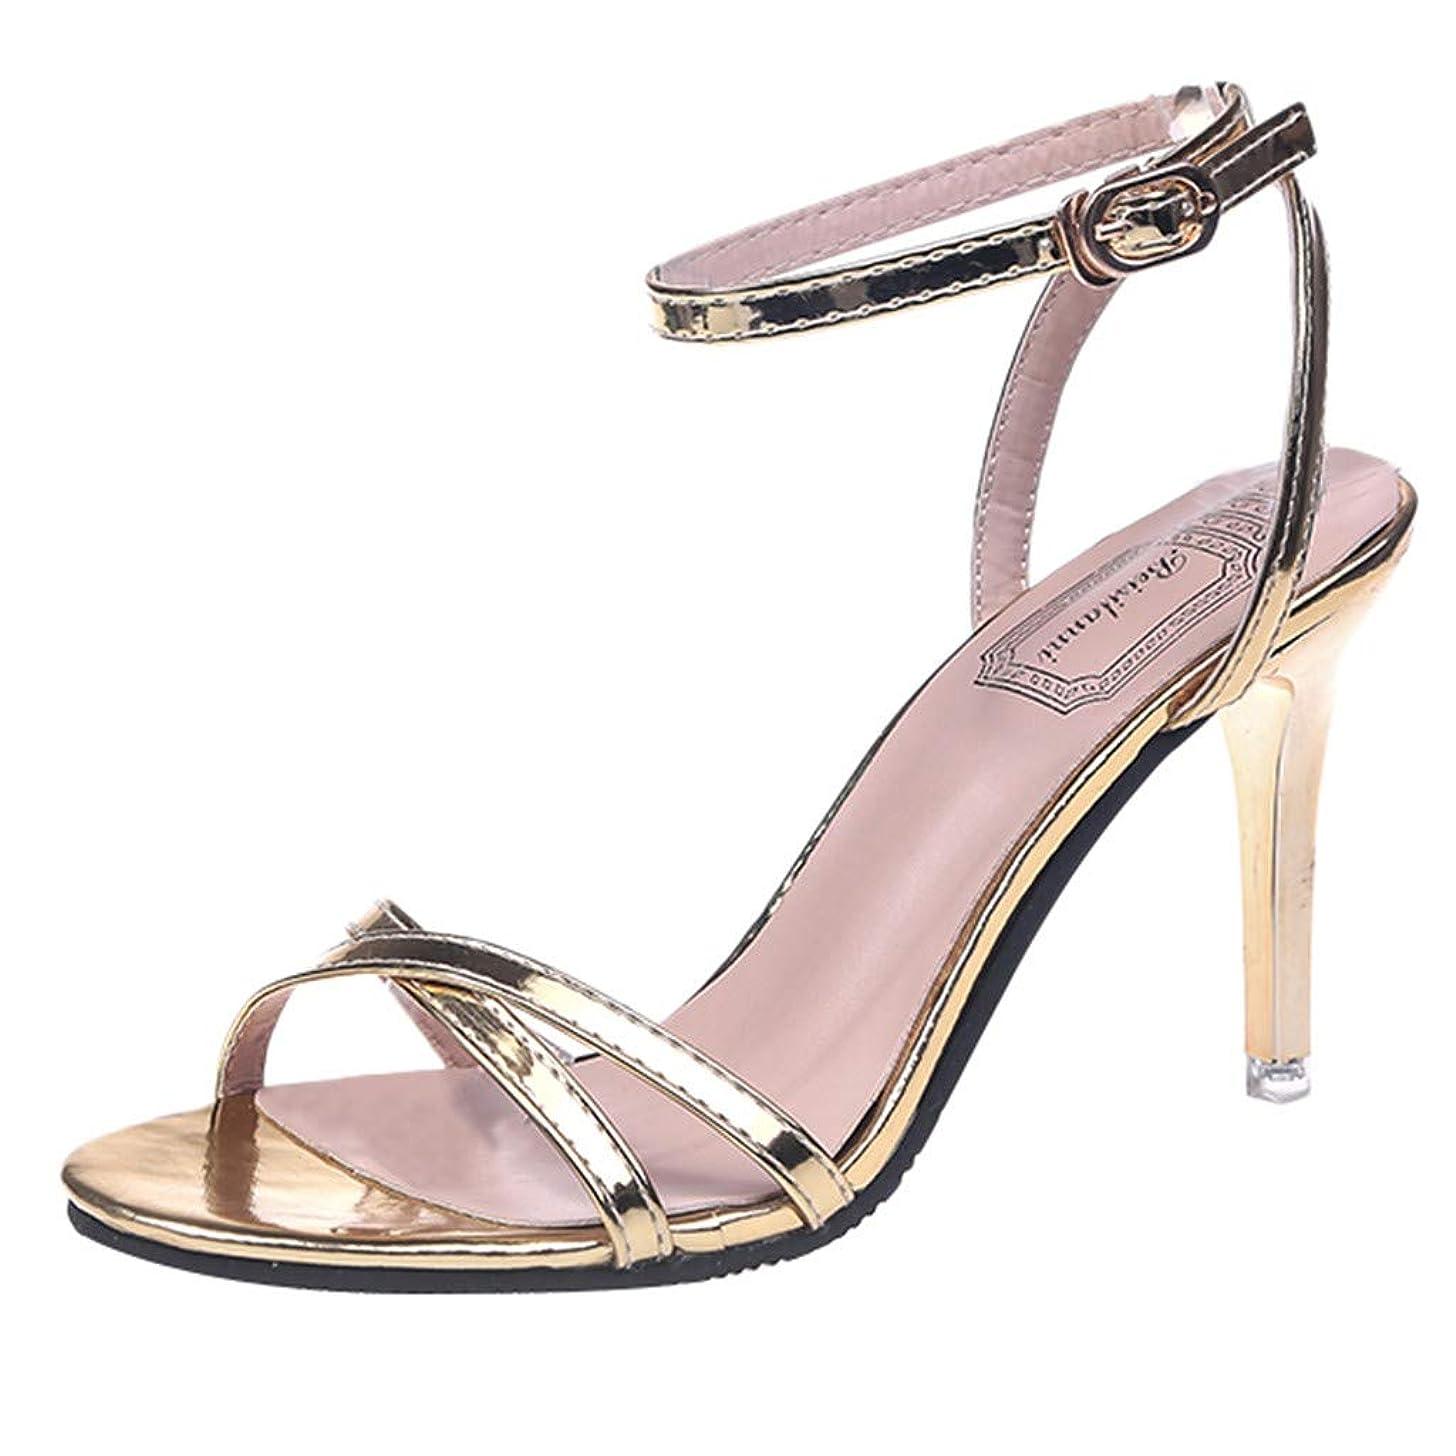 Women's Fashion Ankle Strap Kitten Stiletto High Heel Peep Toe Shoes Casual Office Heeled Sandals JHKUNO